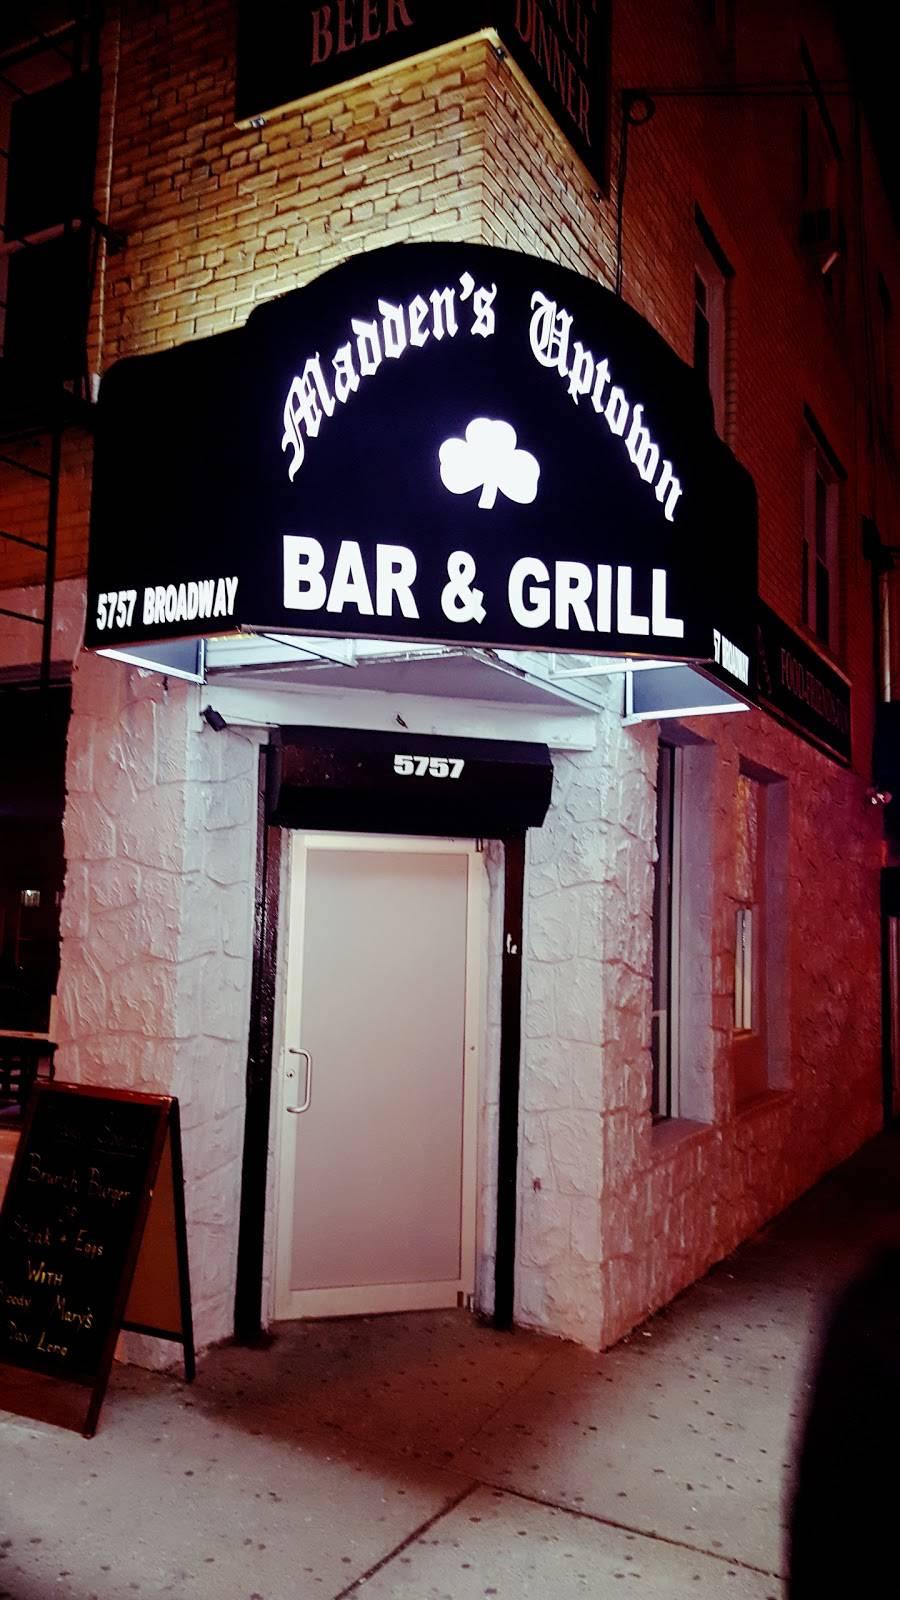 Maddens Uptown Bar & Grill | restaurant | 5757 Broadway, Bronx, NY 10463, USA | 9292433480 OR +1 929-243-3480